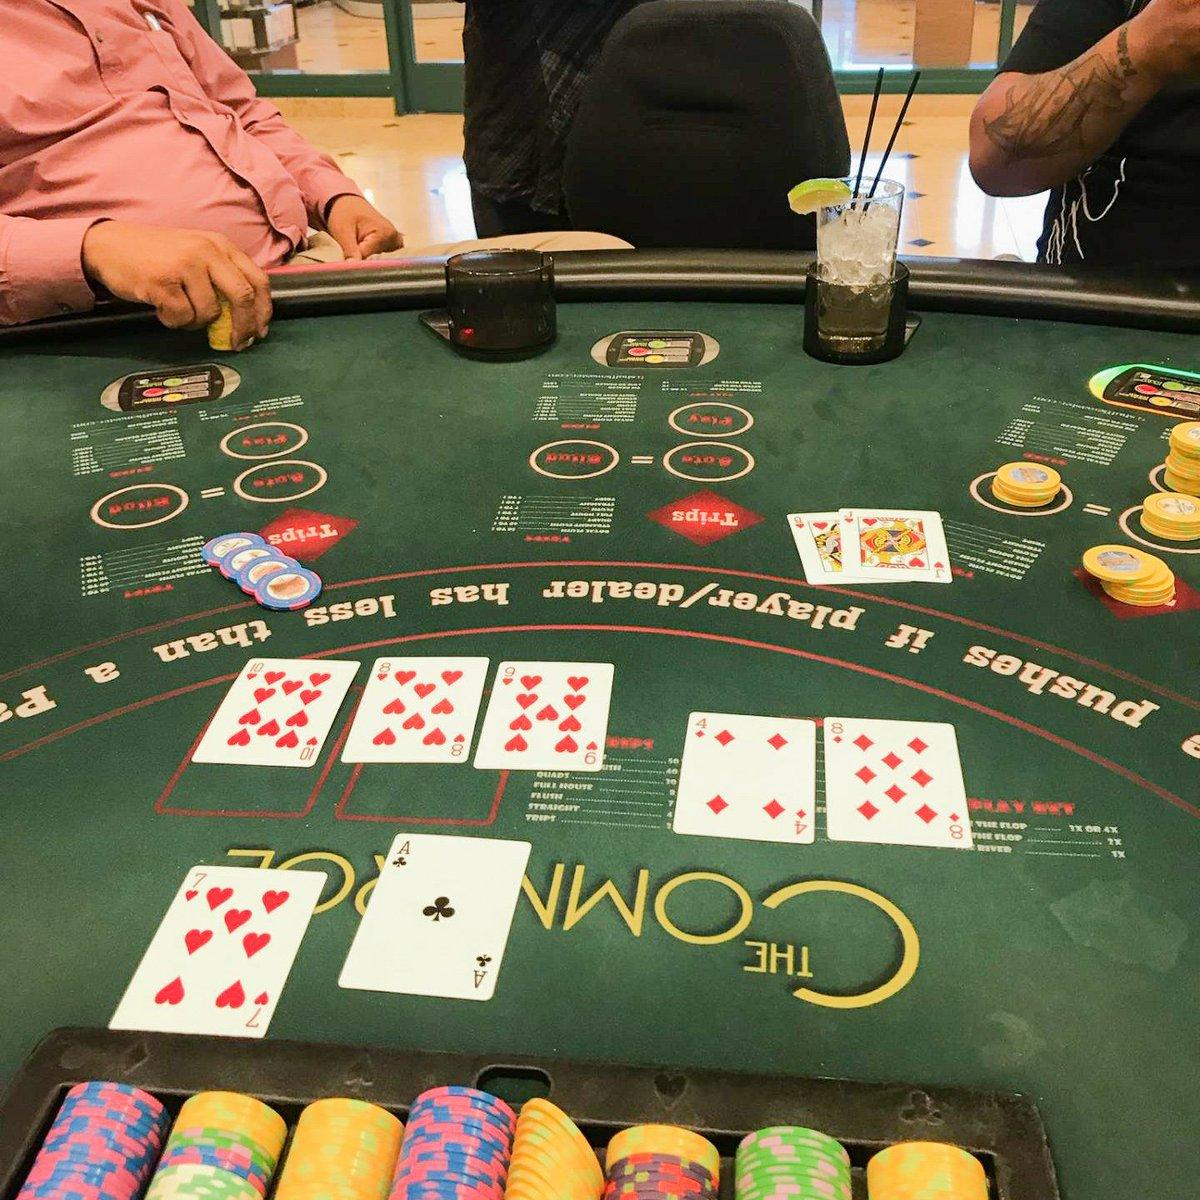 Commerce casino 3 card poker subtitles of casino royale